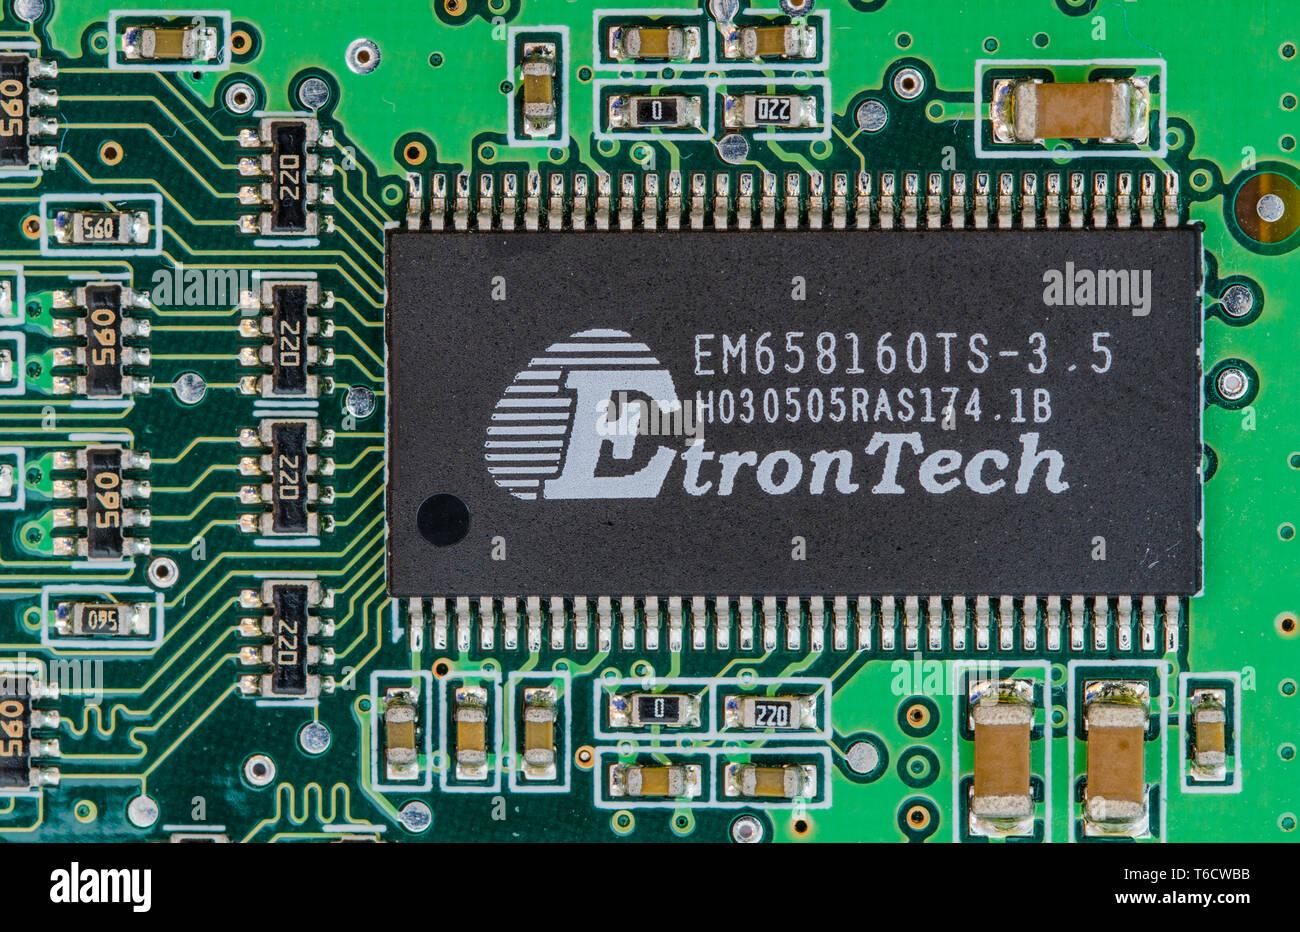 Dual in Line (DIL- oder DIP) Paket Surface Mount Technology (SMT) EtronTech Chip in einer Leiterplatte montiert. Elektronik Platine Makro Nahaufnahme. Stockbild